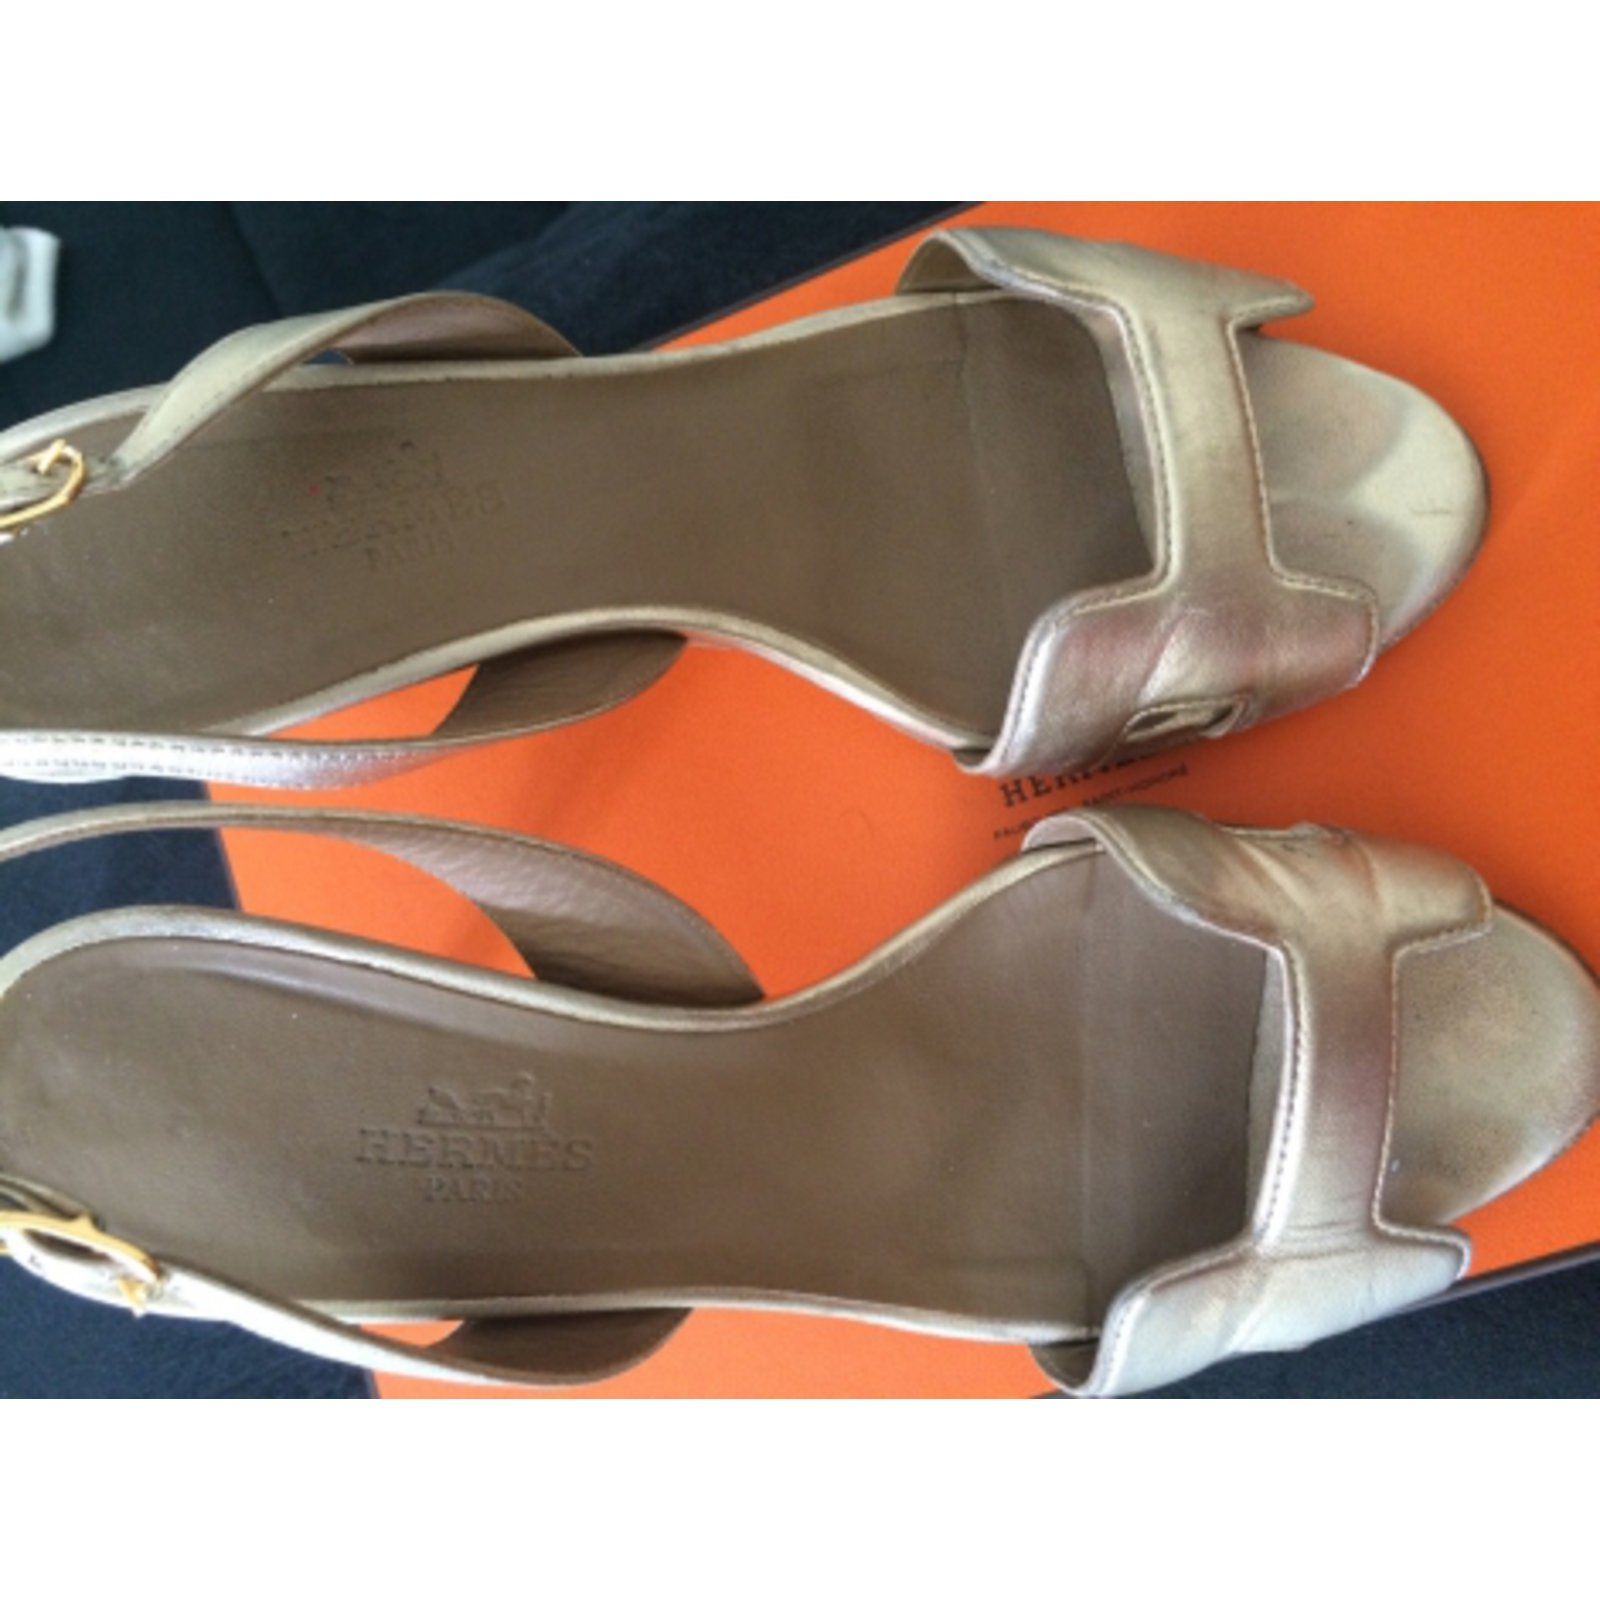 b76dd389c97 Facebook · Pin This. Hermès Sandals Sandals Leather Golden ref.5345